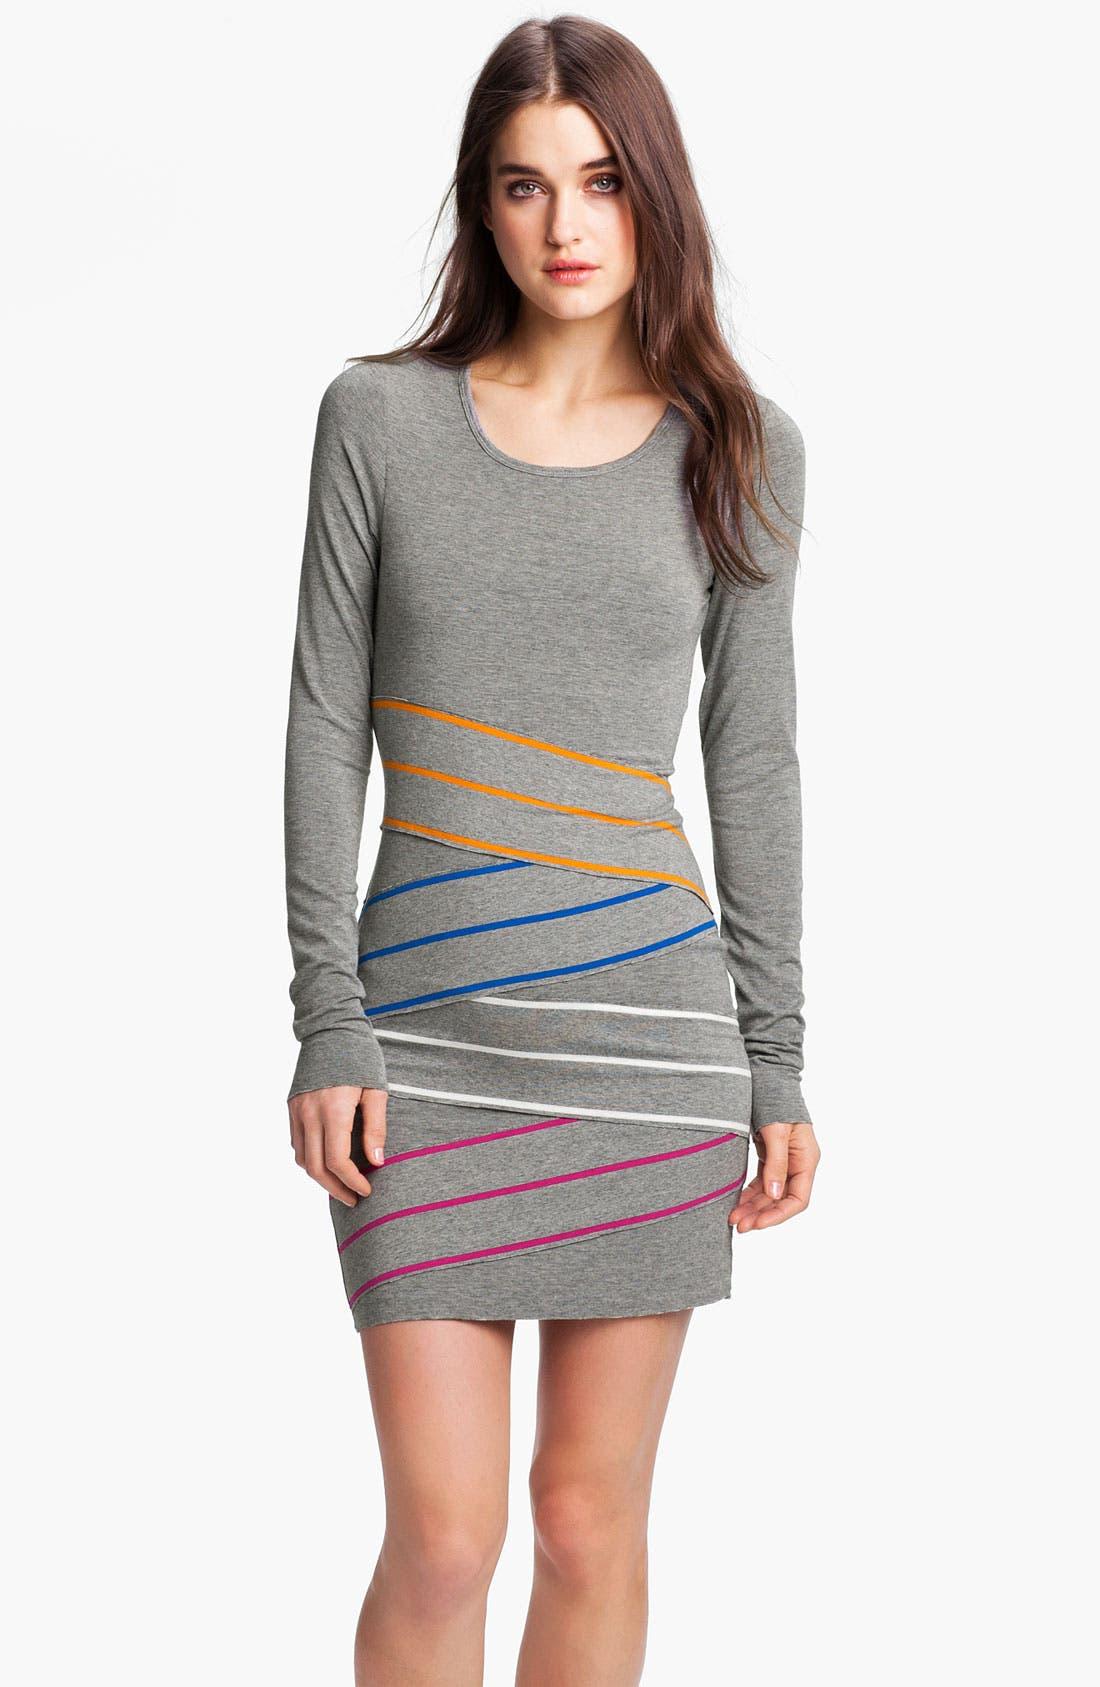 Alternate Image 1 Selected - B44 Dressed by Bailey 44 'Triathlon' Multi Stripe Jersey Dress